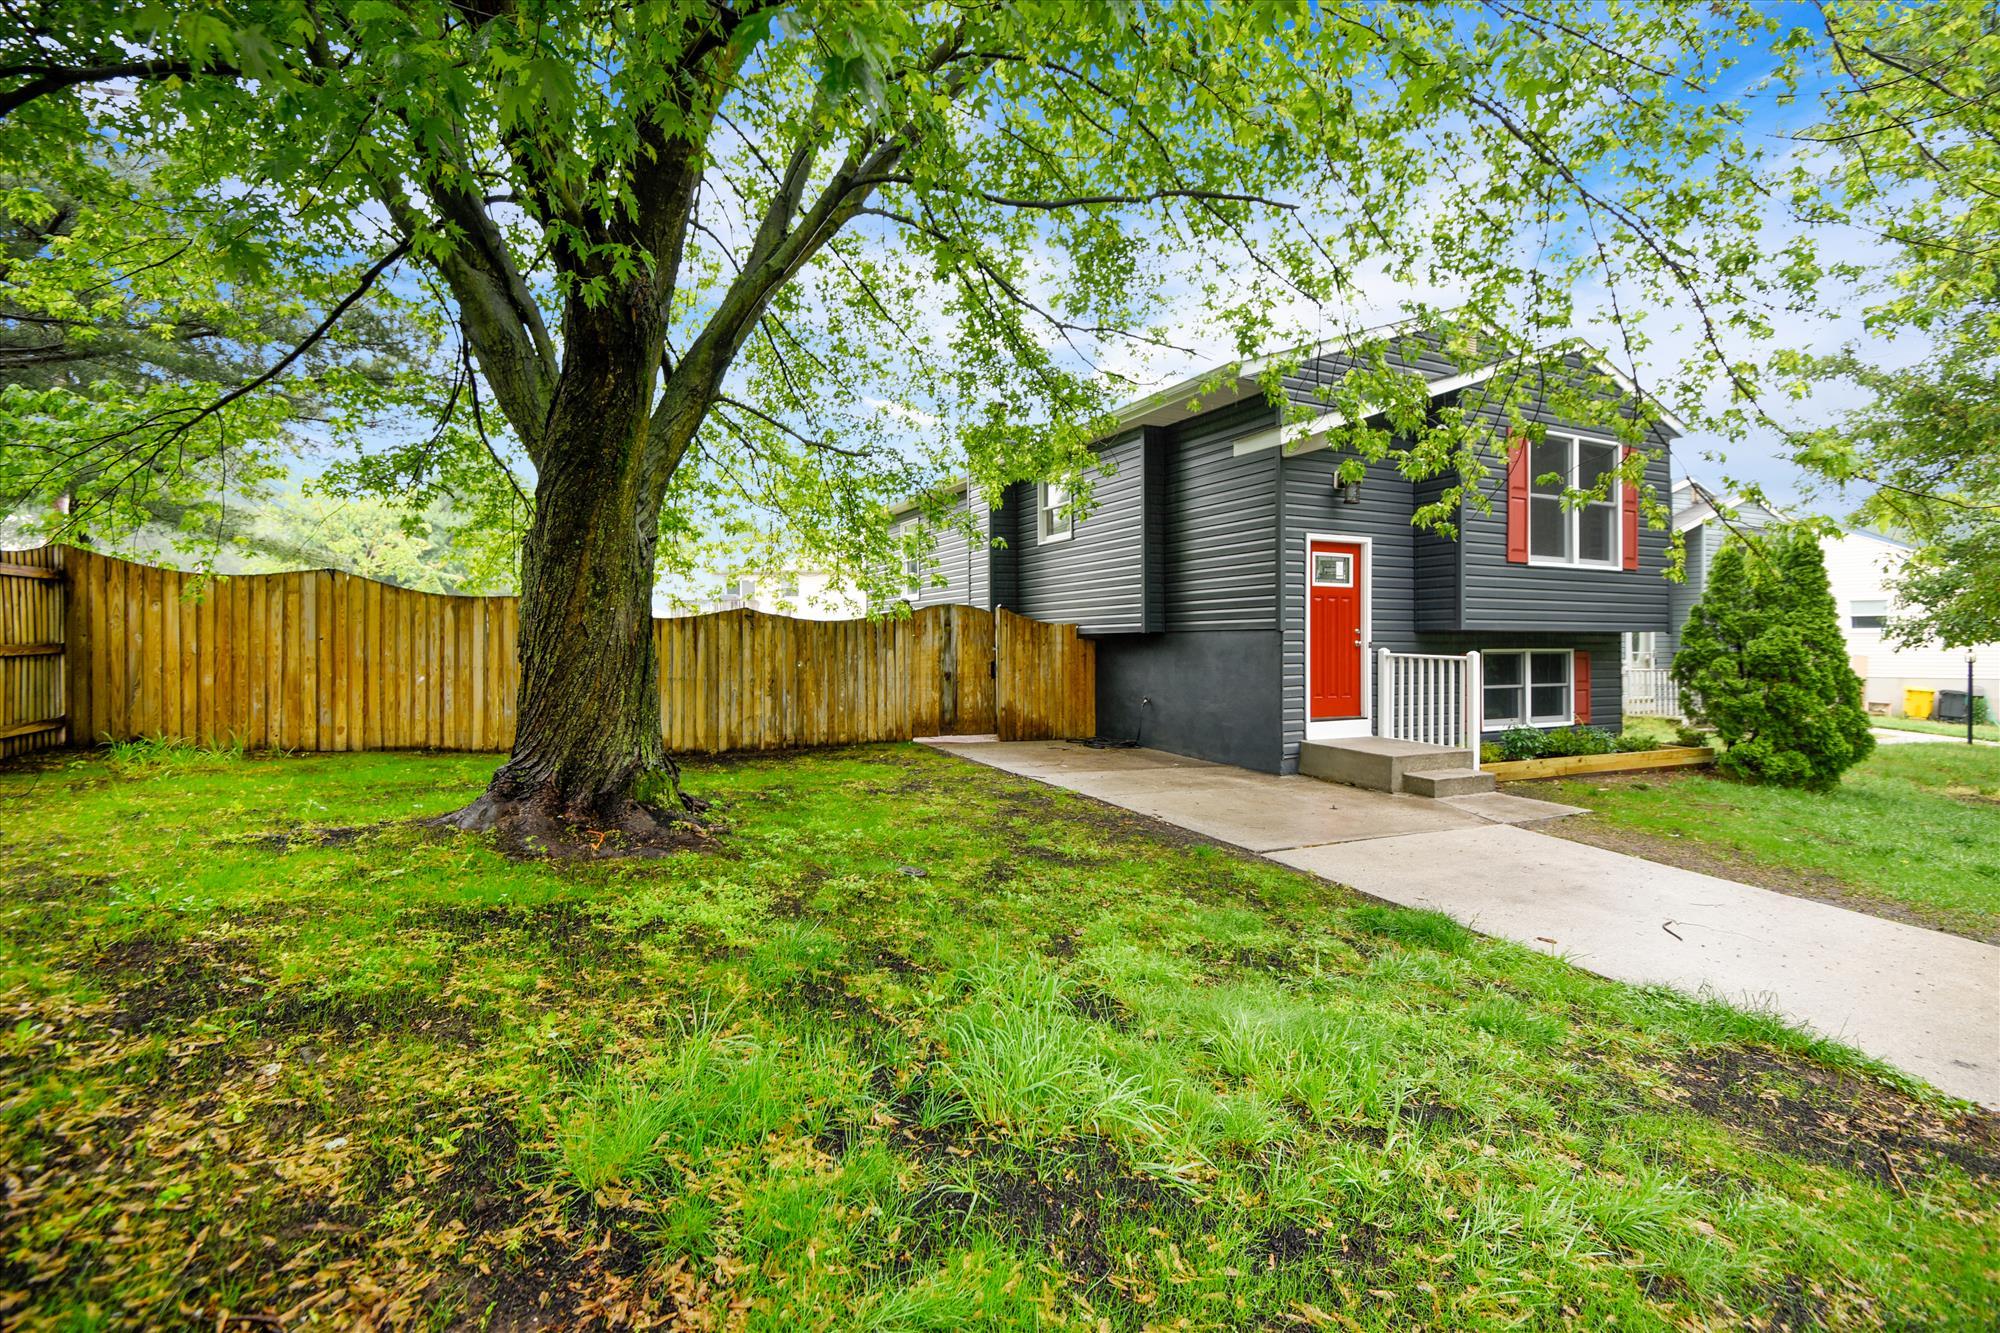 Exterior-Yard-_DSC3282